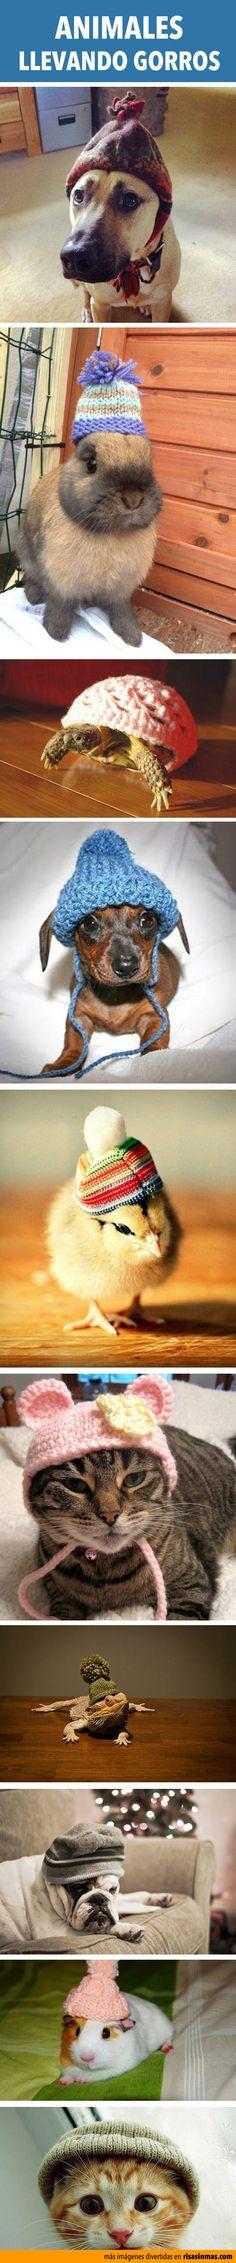 Animales llevando gorro